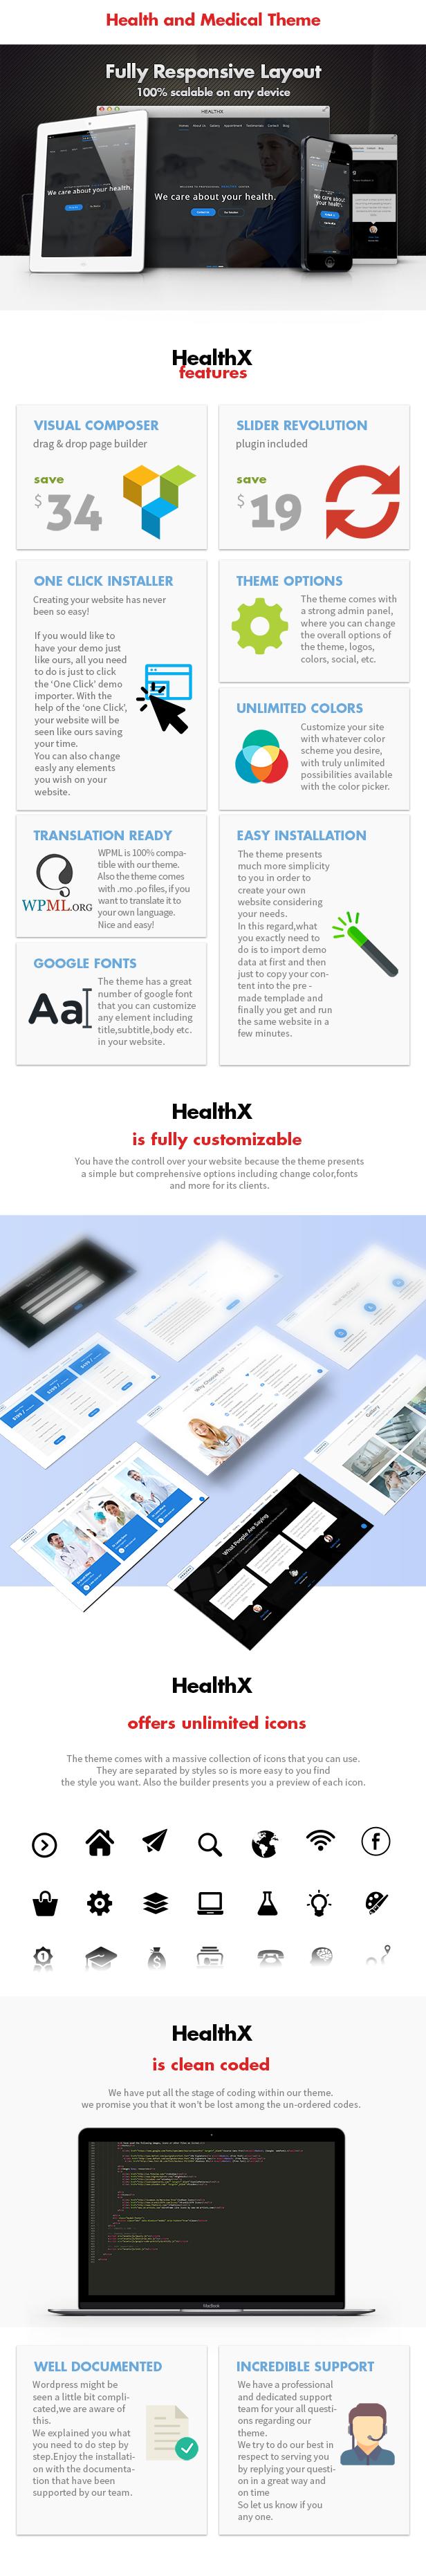 HealthX - Health and Medical Theme - 6